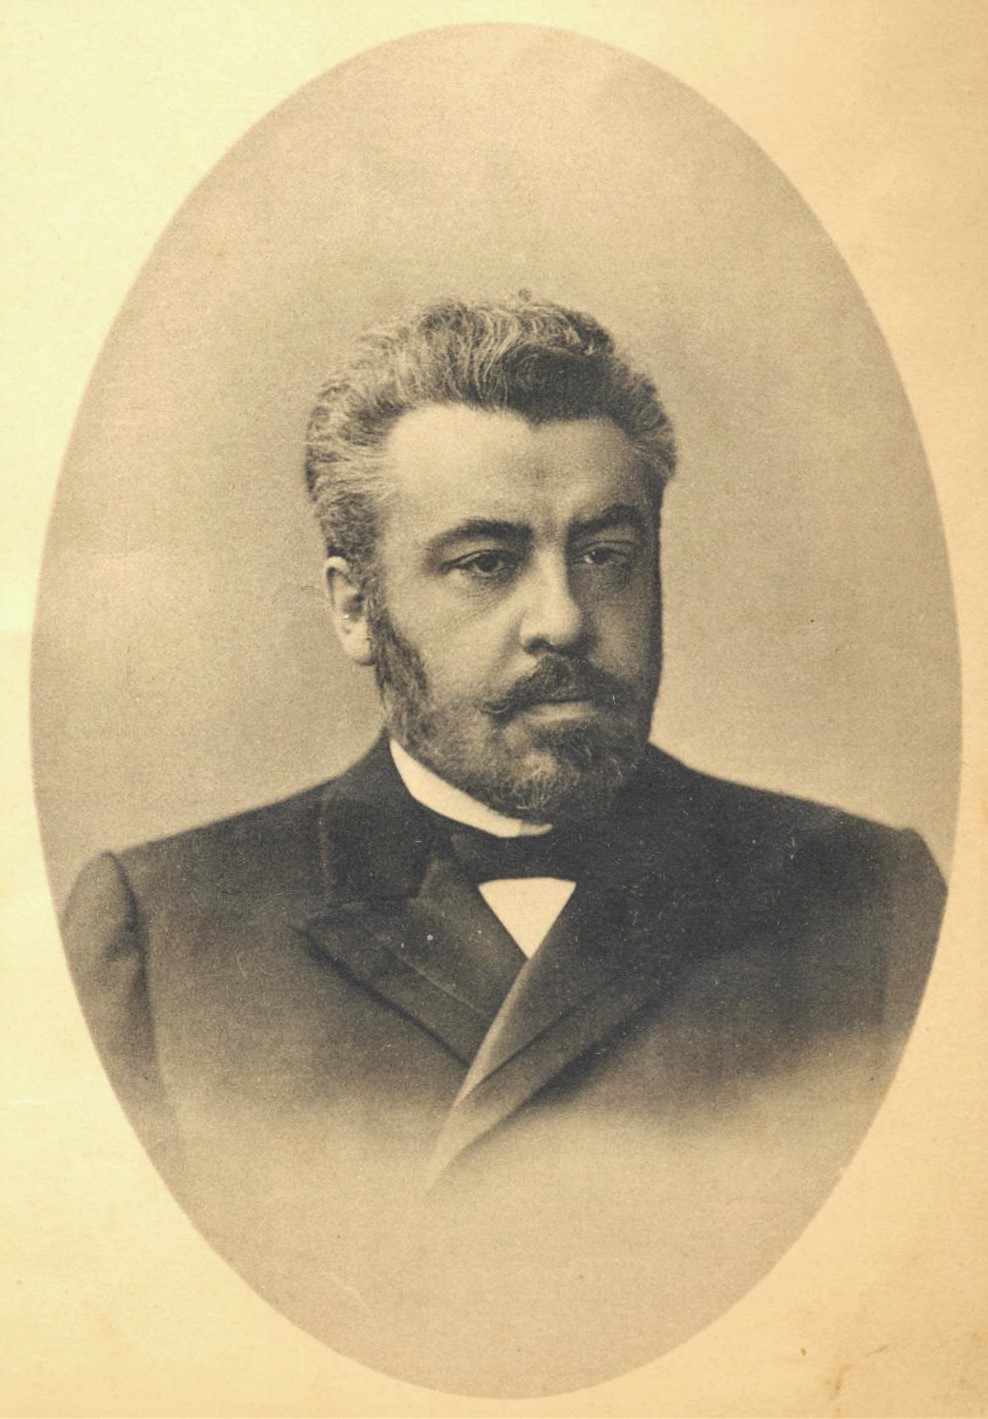 Александр Апполонович Мануйлов, министр народного просвещения